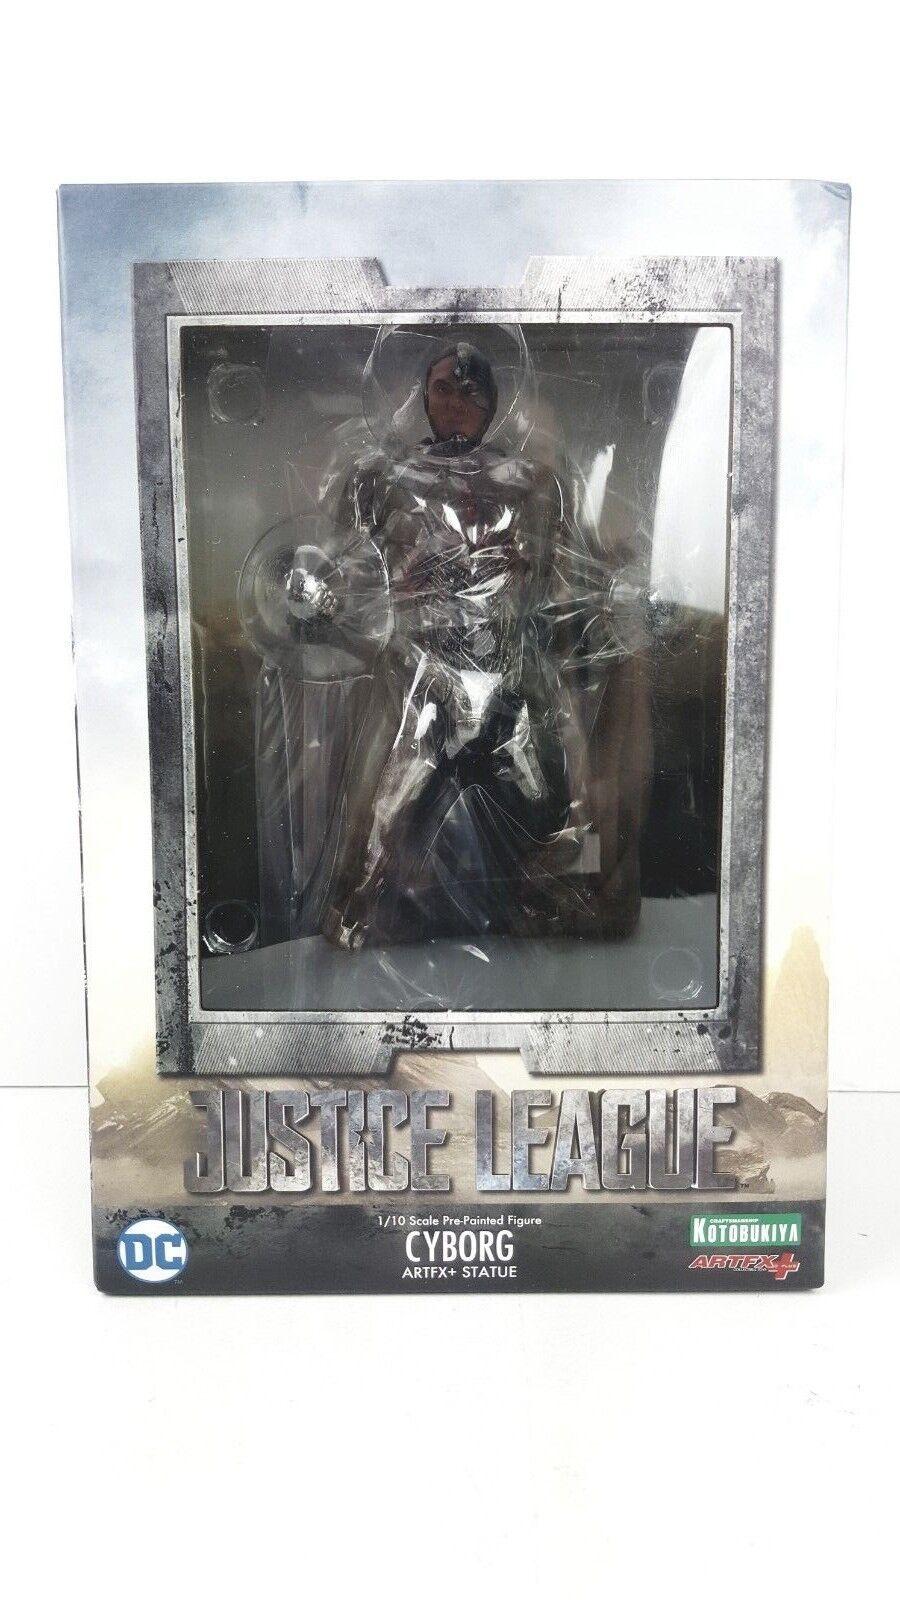 Cyborg  Justice League Kotobukiya DC Comics ArtFX+ Statue Collectible  cifra nuovo  grandi prezzi scontati